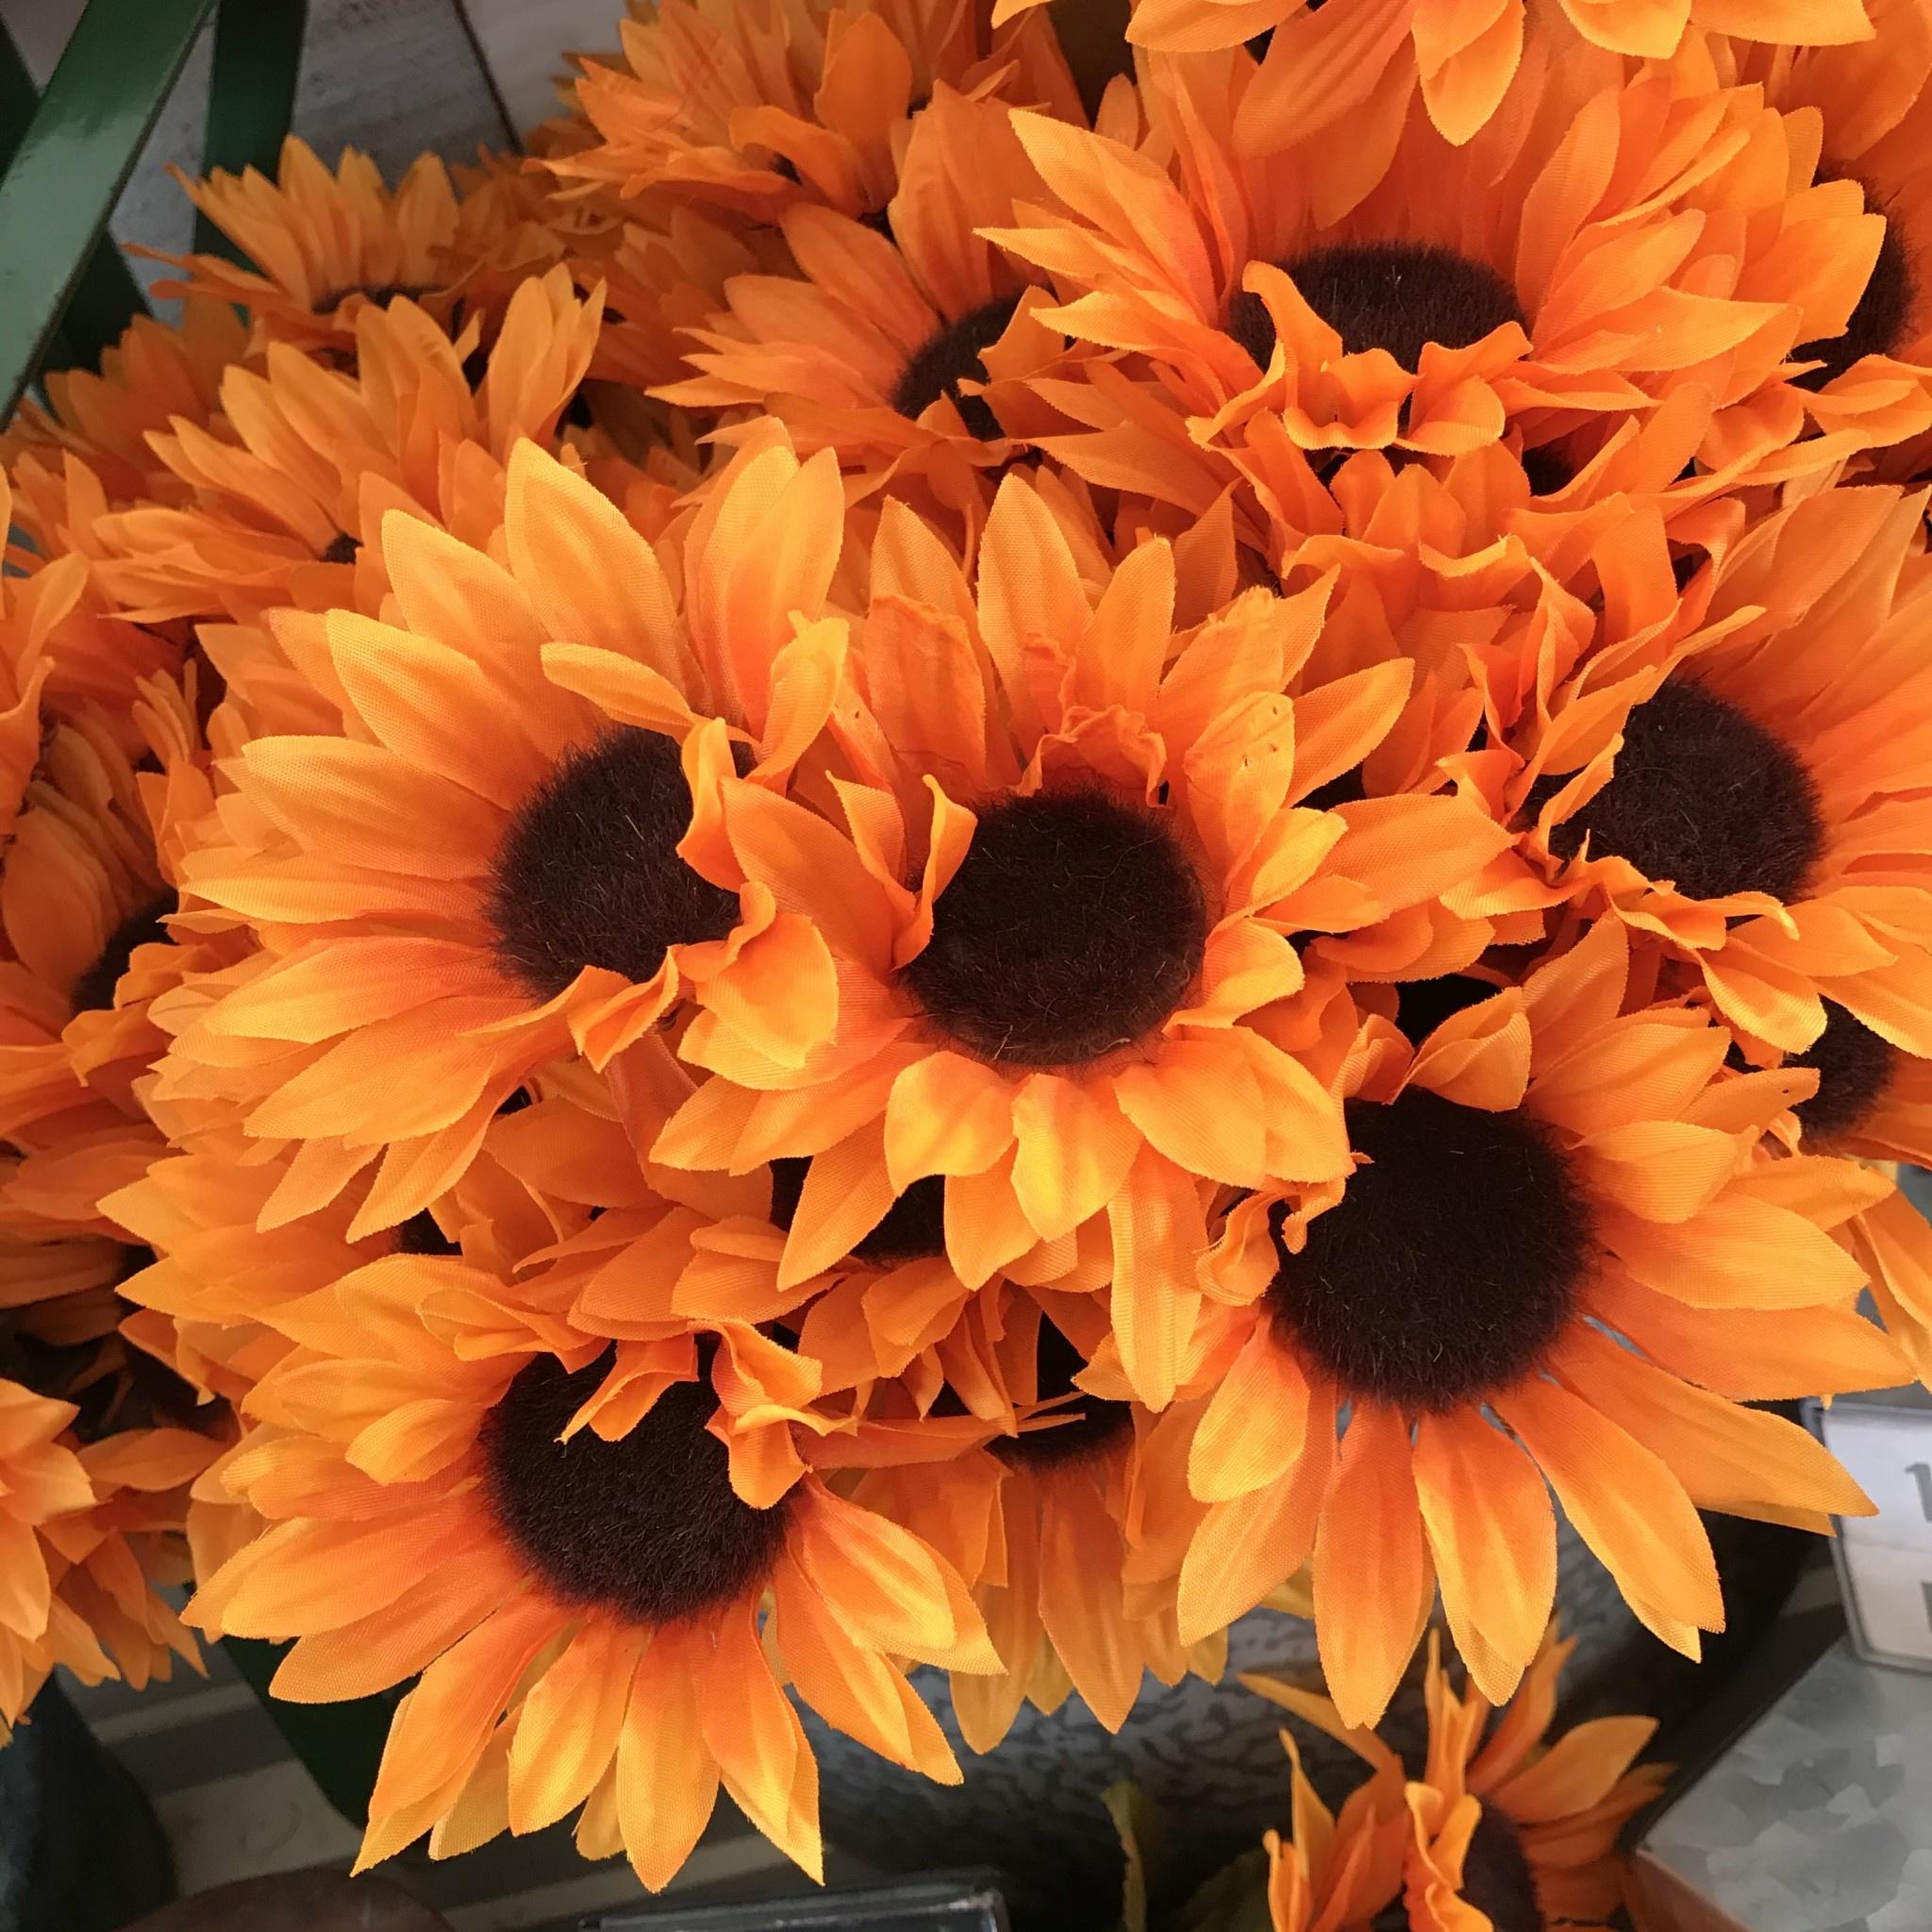 Fleurish Home Autumn Sunflower Bunch